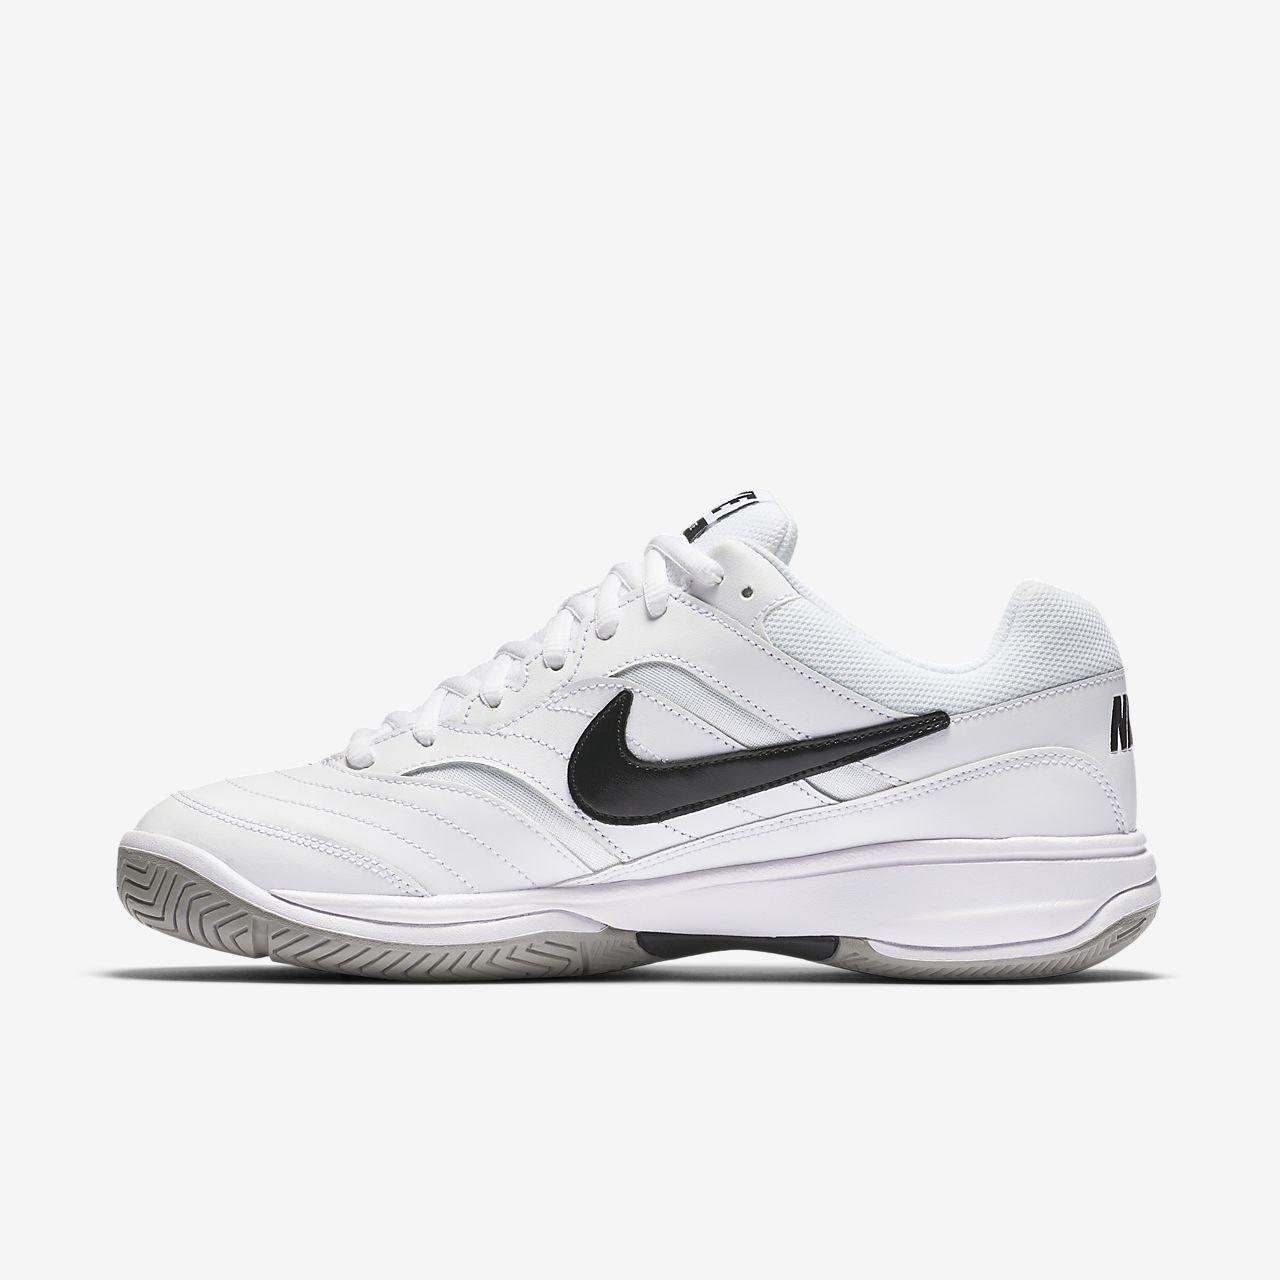 3f9fab01c56d NikeCourt Lite Men s Hard Court Tennis Shoe. Nike.com AU